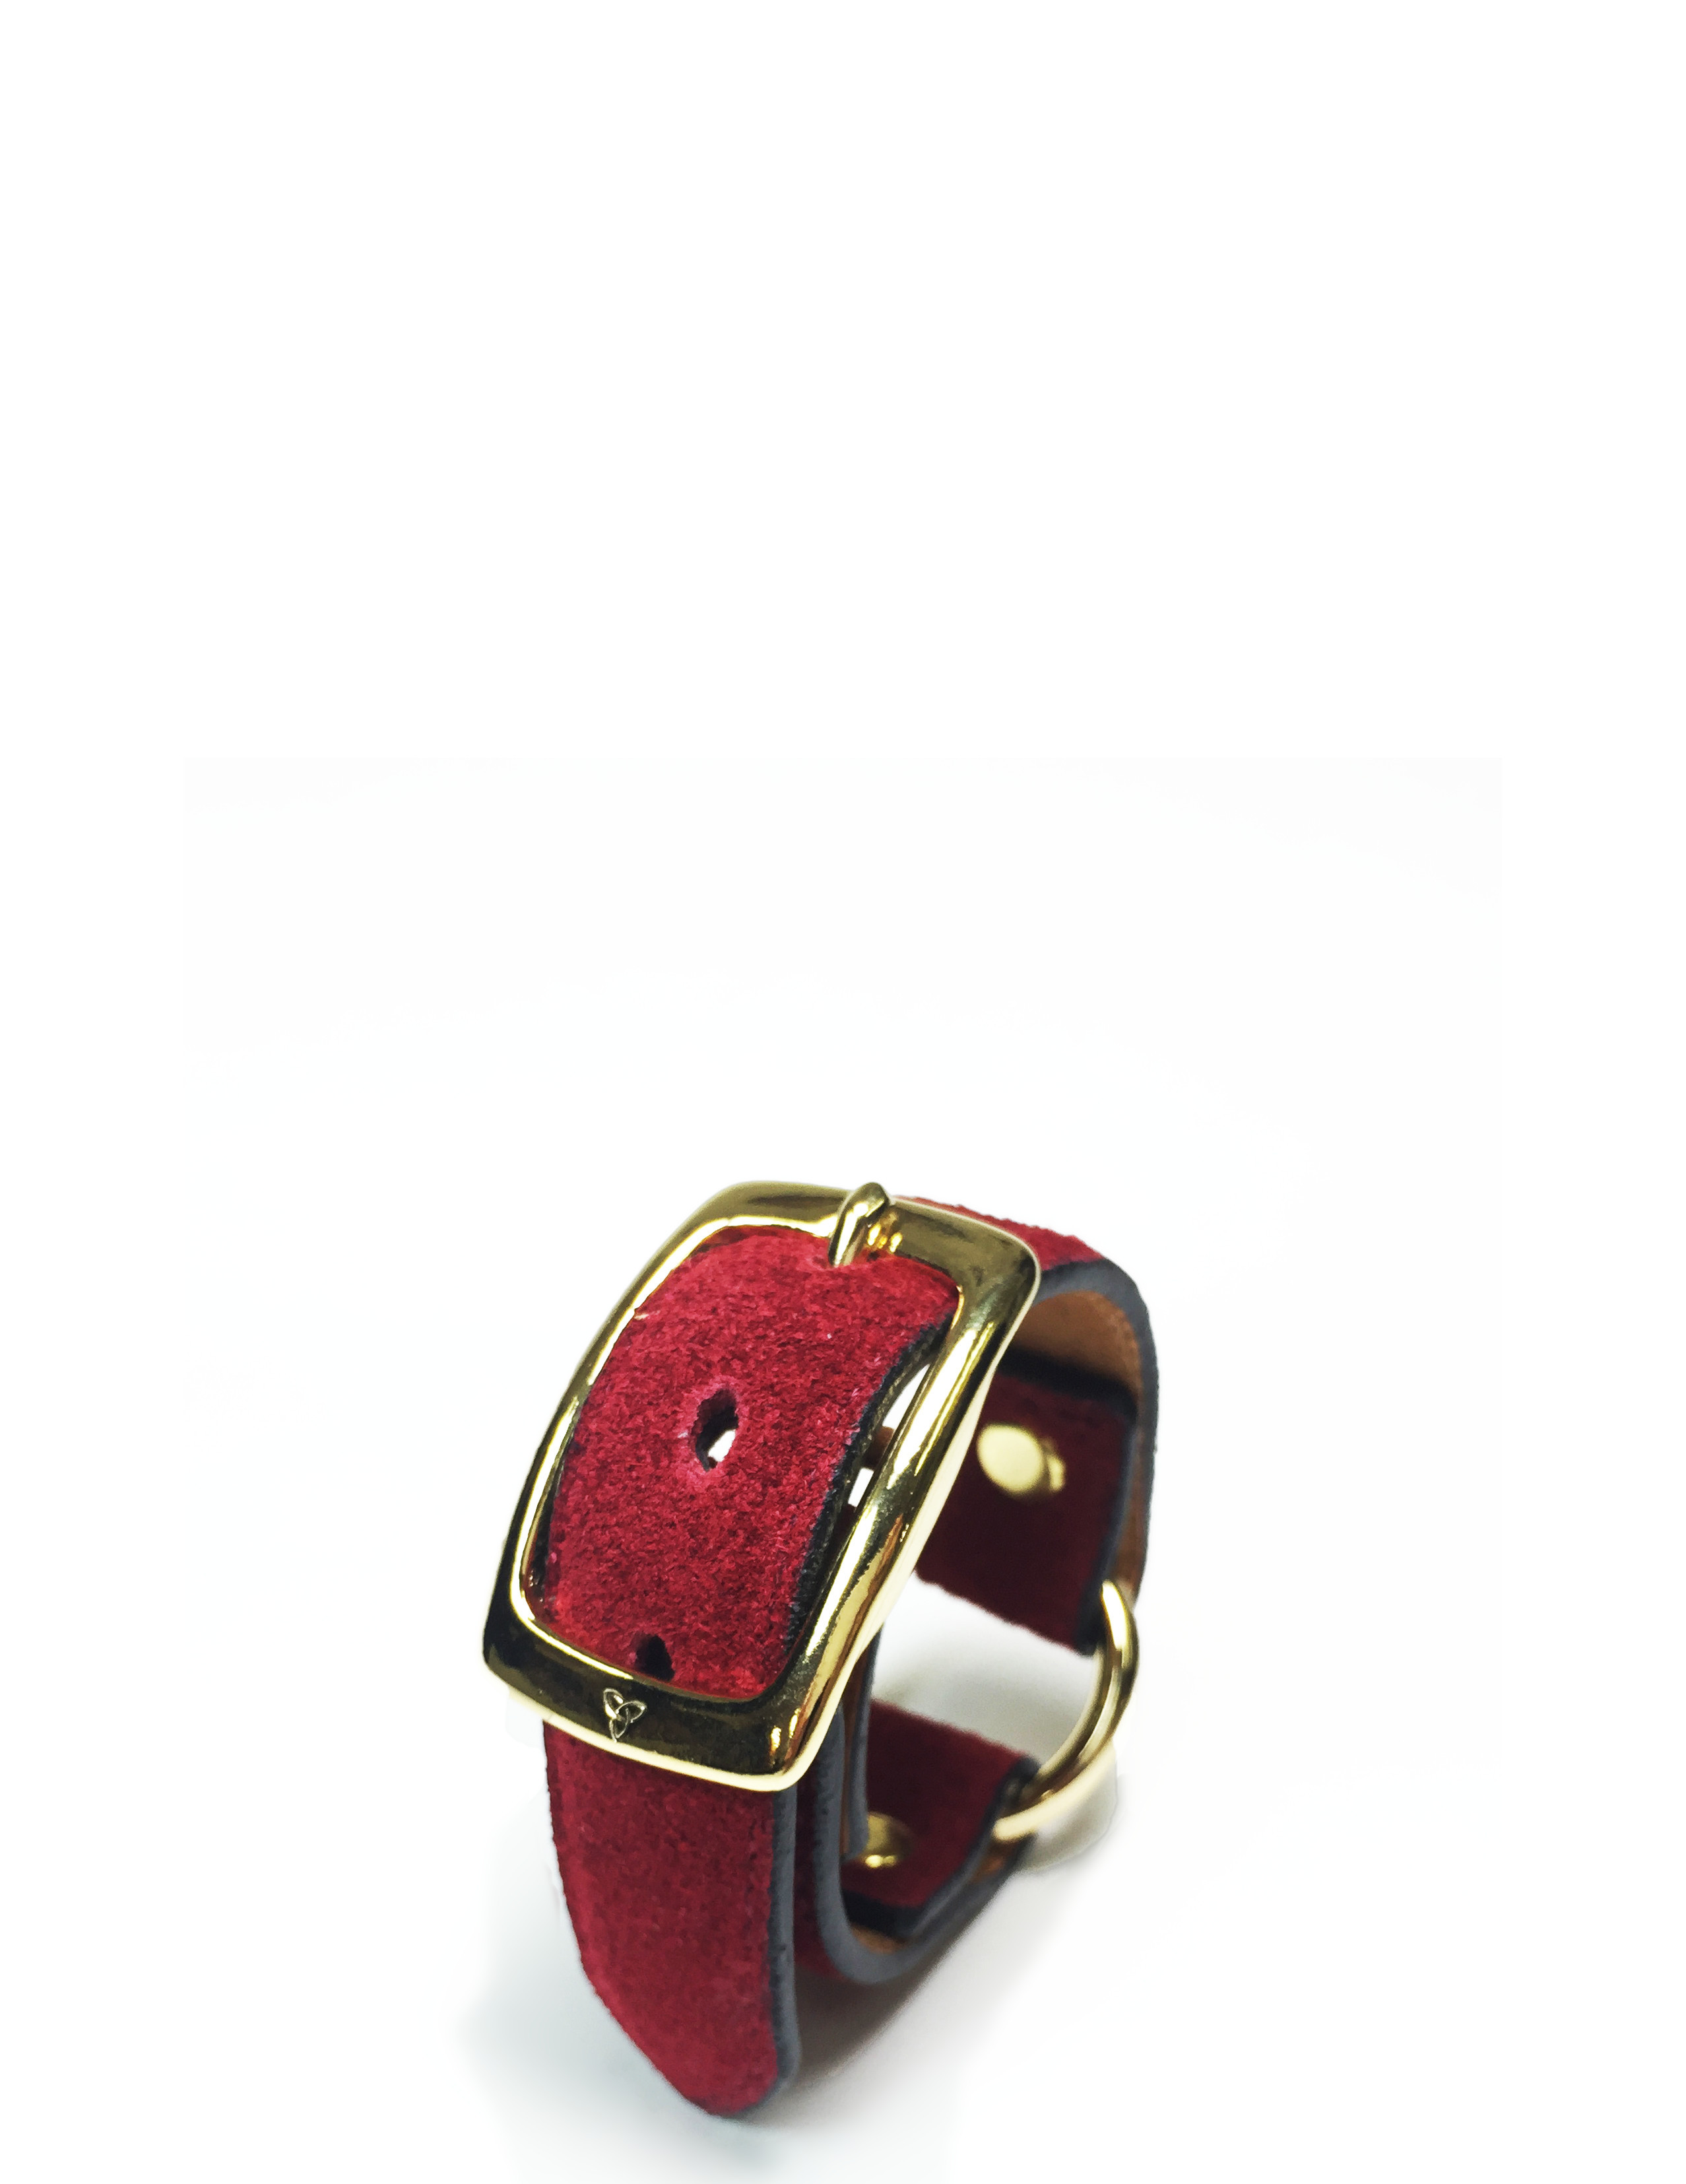 nahezugleich / Suede Ring bracelet - 画像5